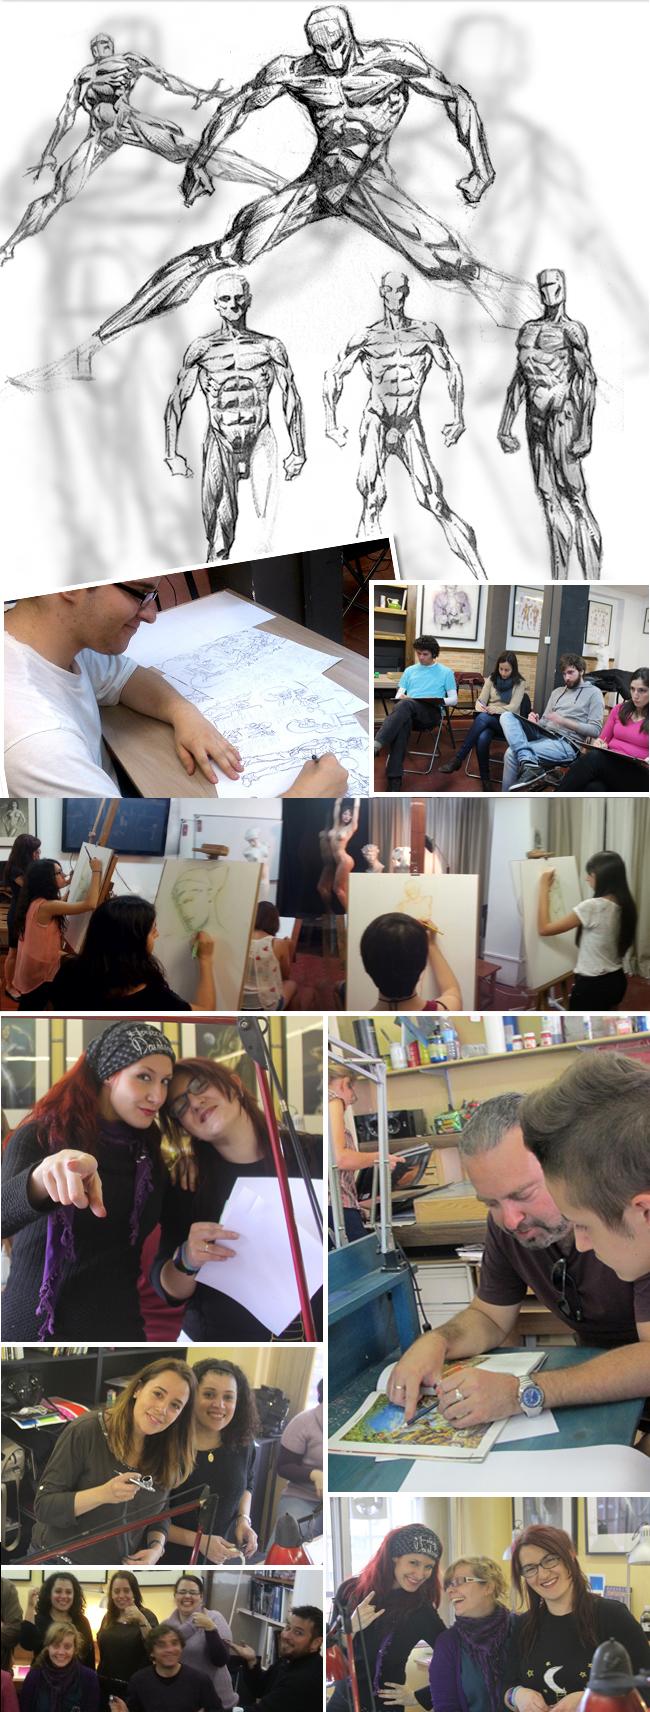 Master-C10-Academia-C10-aulas-de-dibujo-comic-ilustracion-aerografia-dibujo-digital-manga-fx-maquillaje